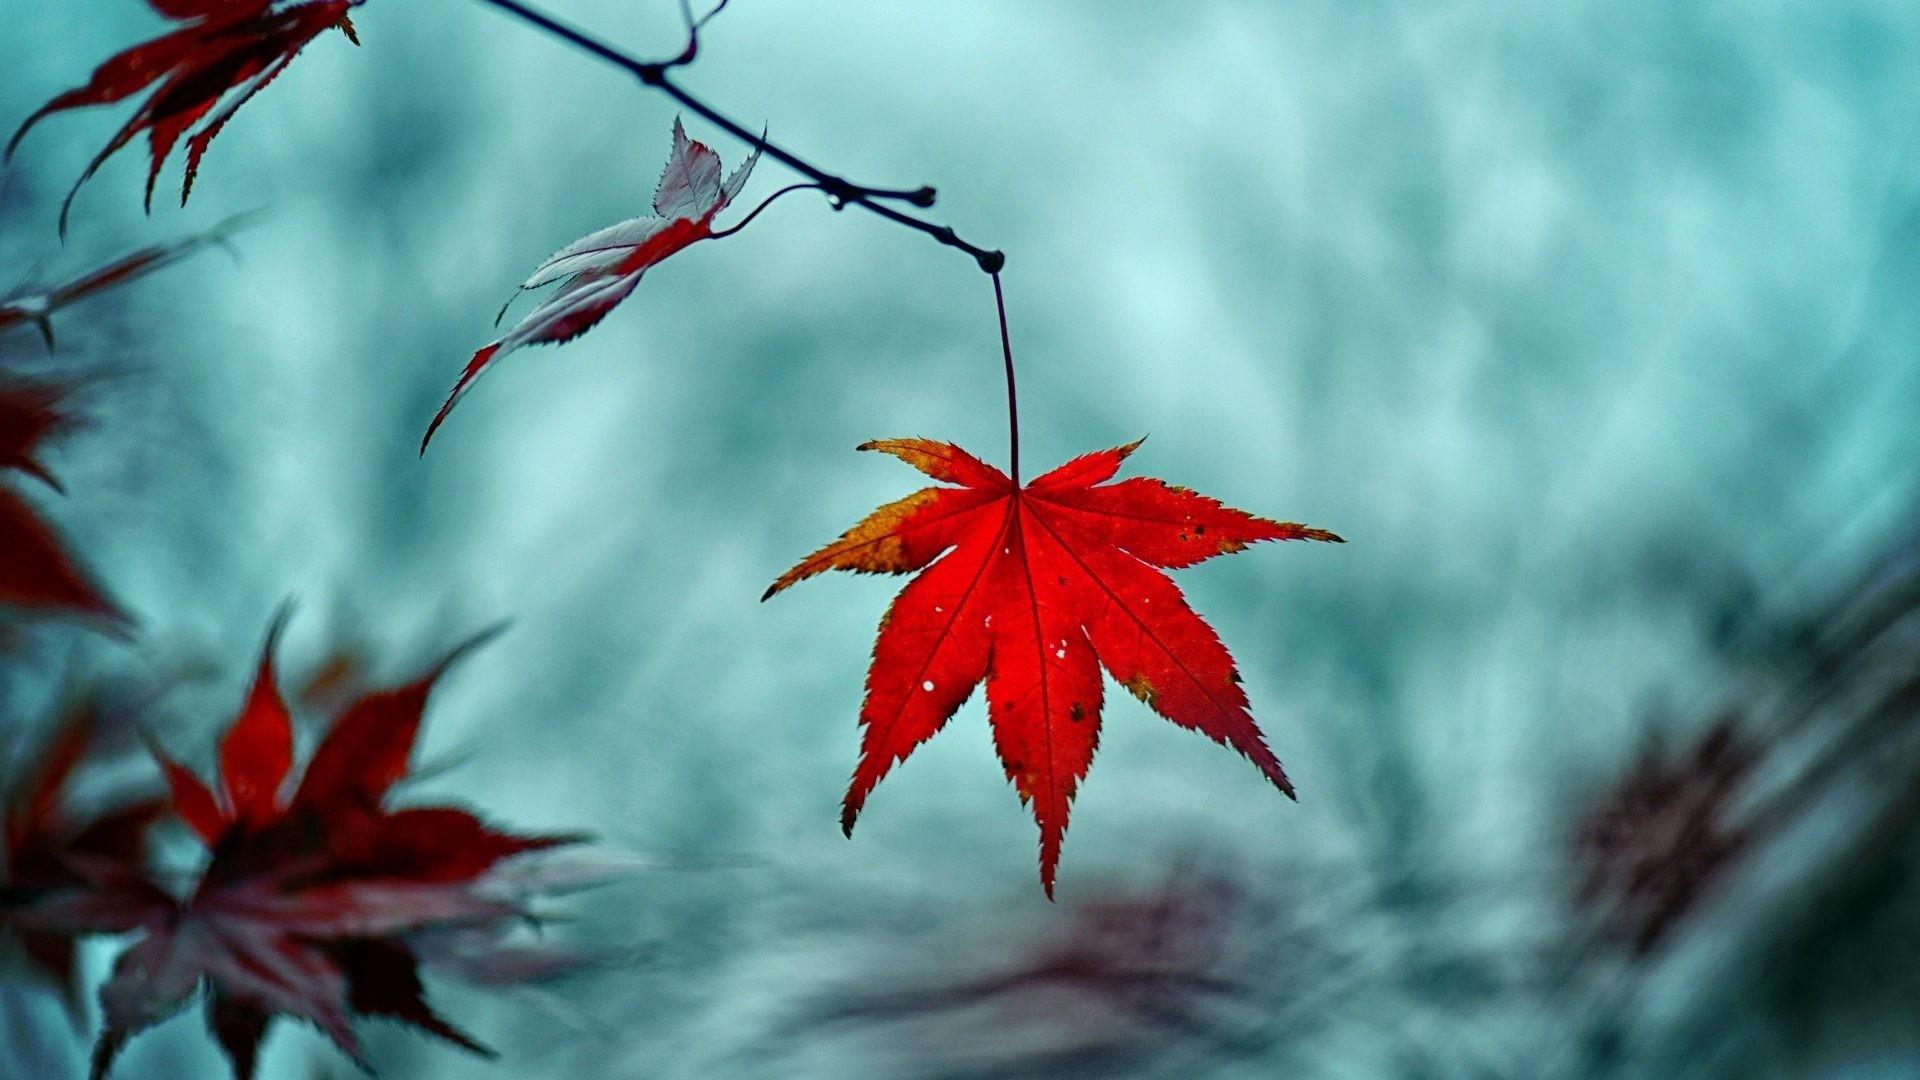 Autumn Leave Nature Fall Desktop Backgrounds – 1920×1200